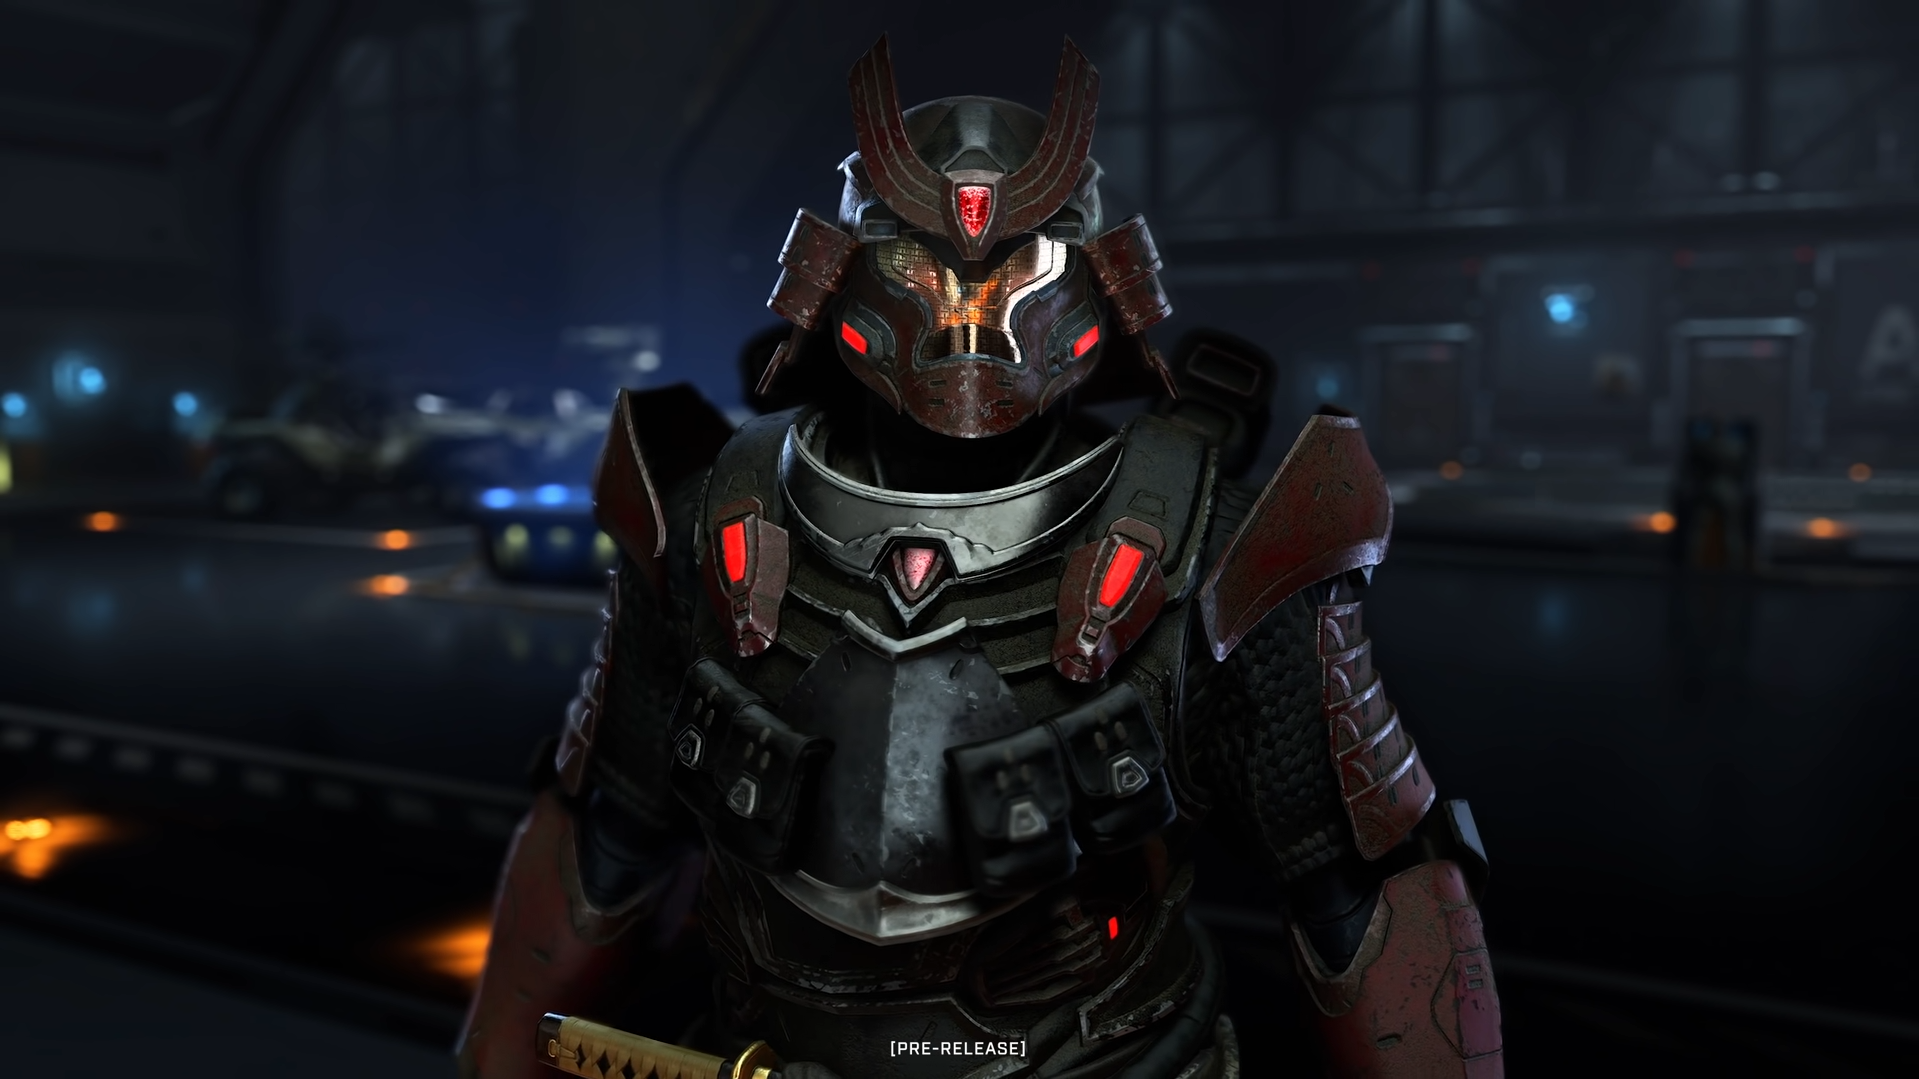 Halo Infinite Event Armor